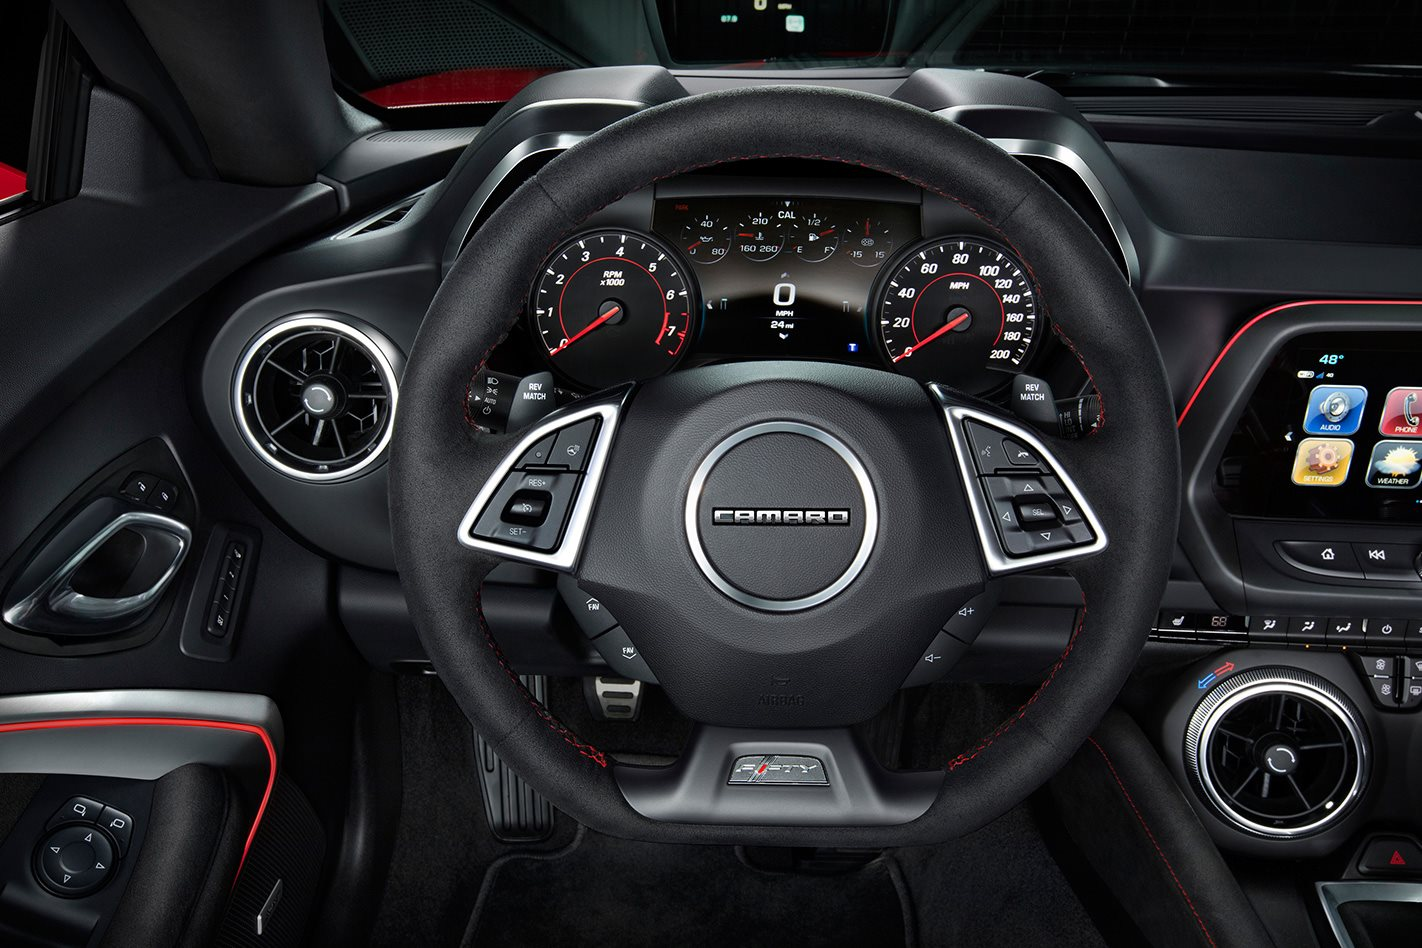 2018-Chevrolet-Camaro-ZL1-1LE-steering-wheel.jpg